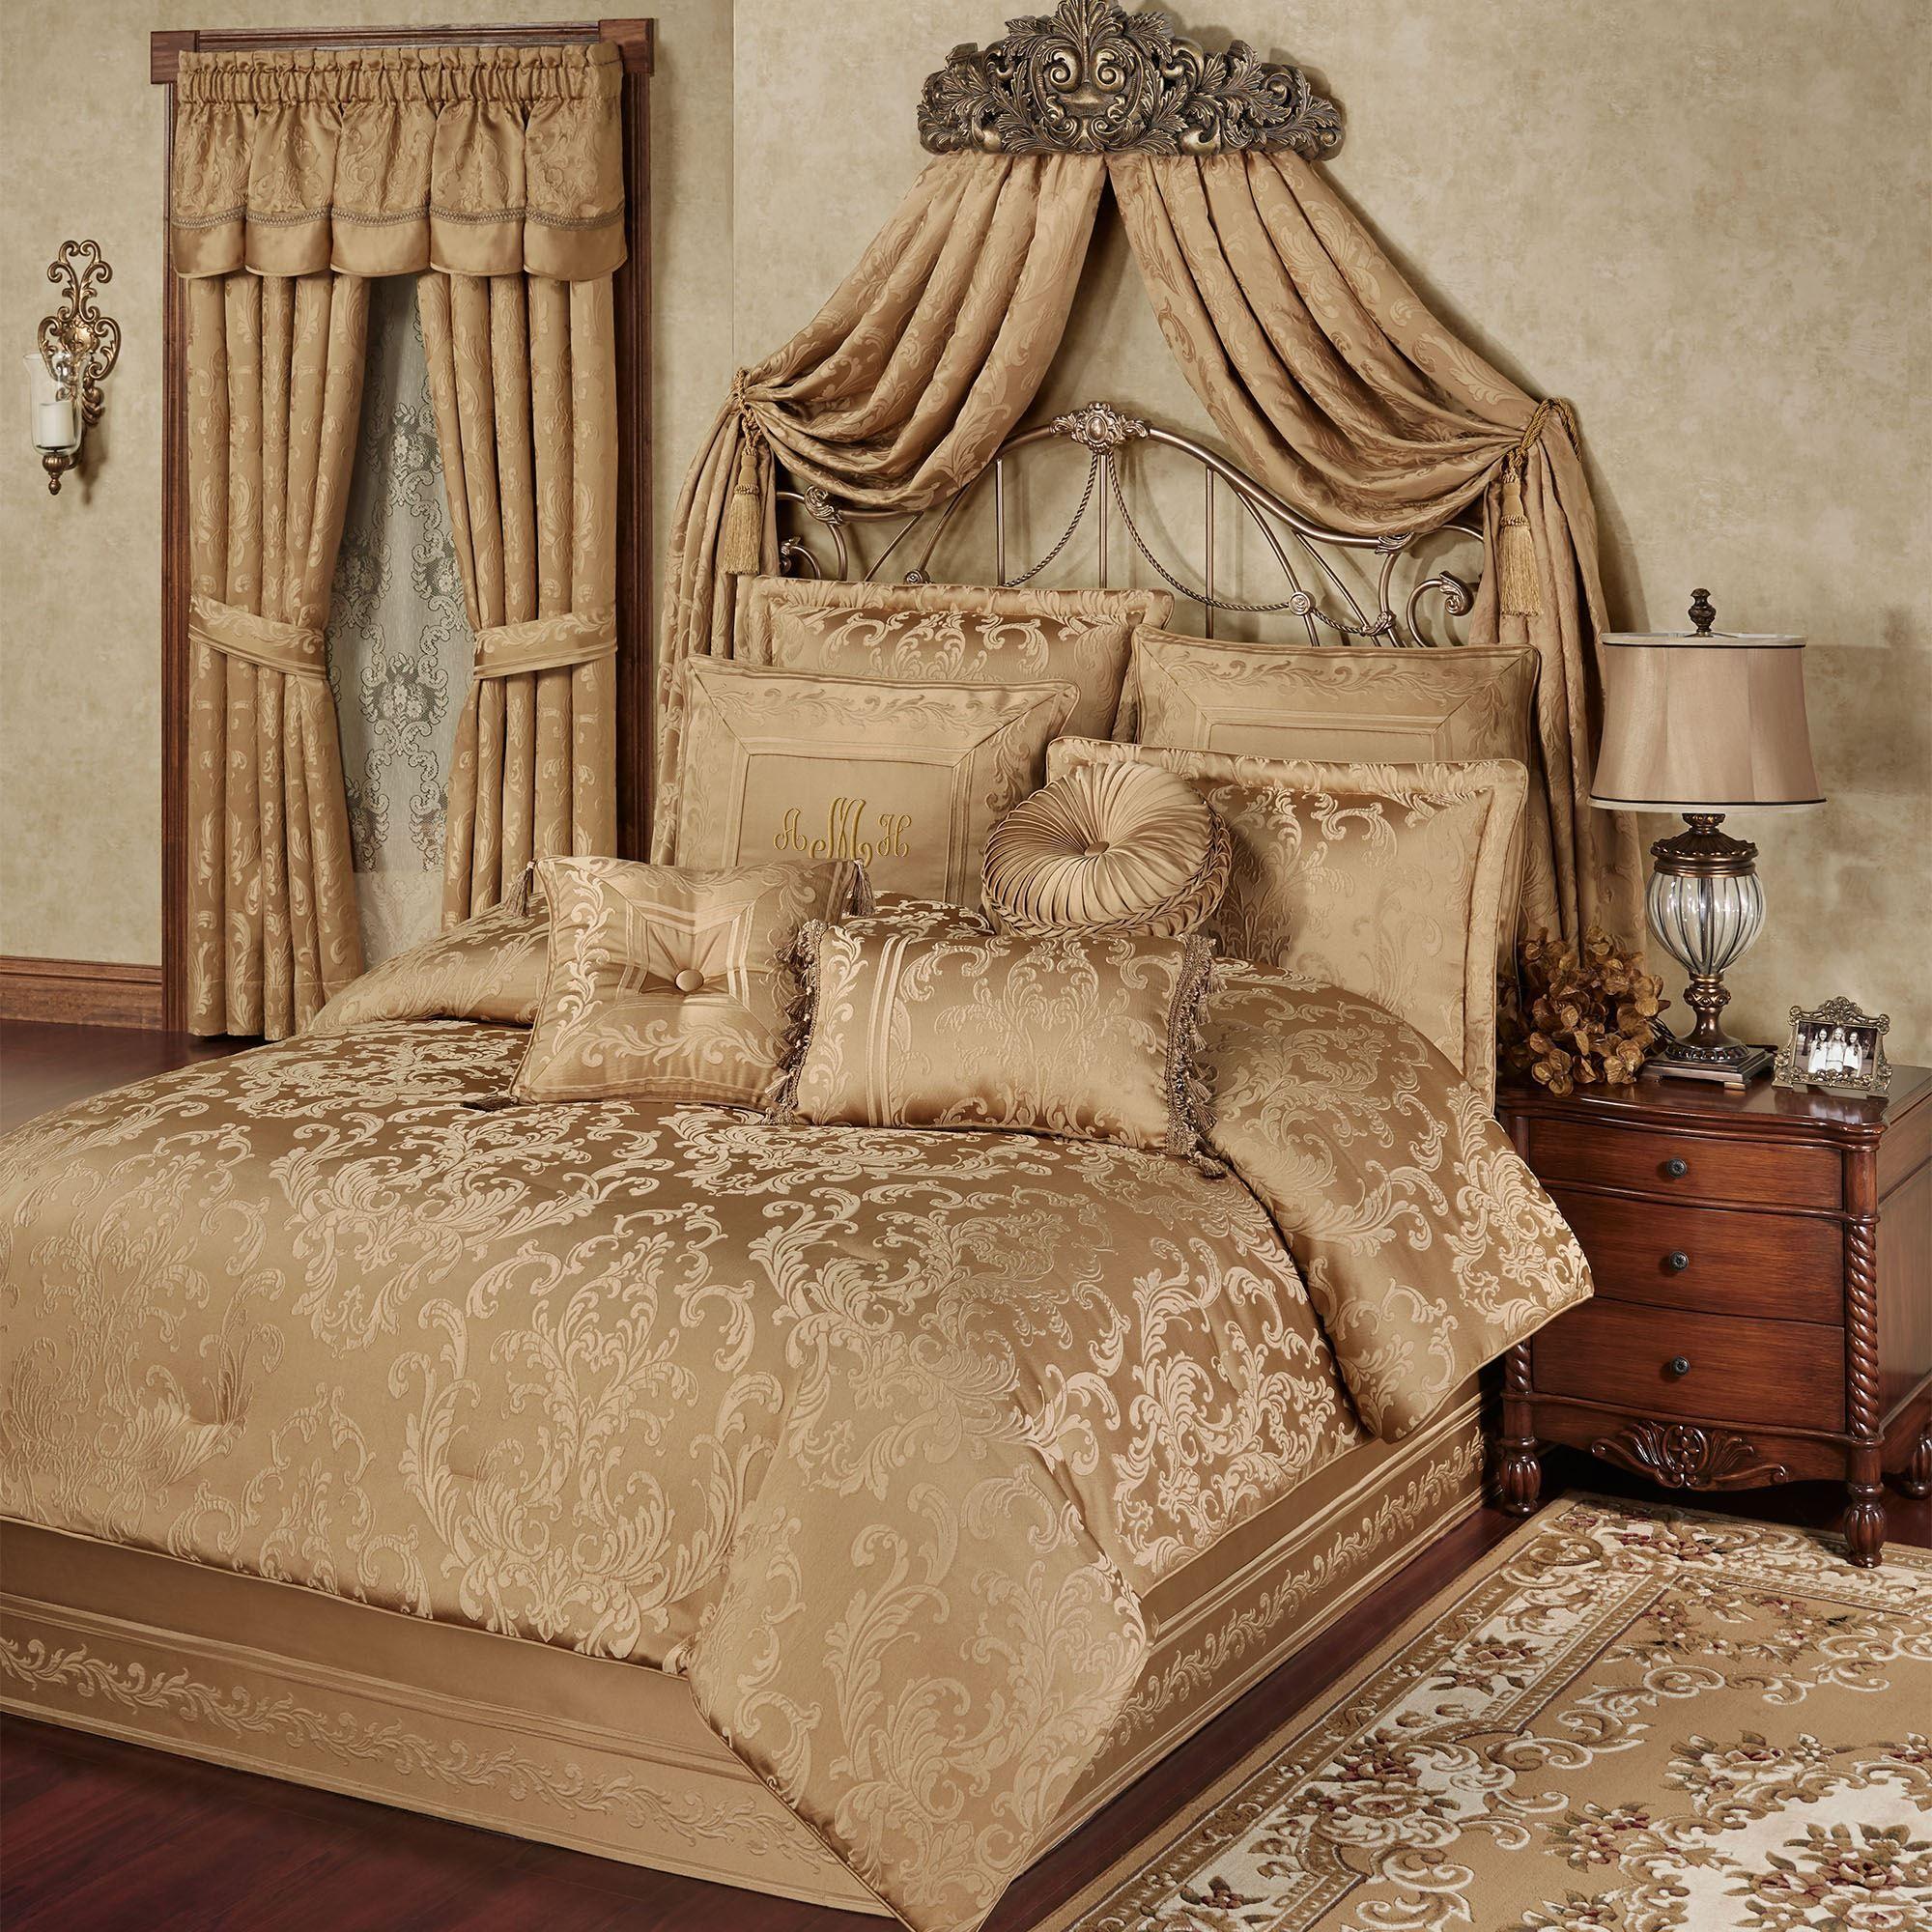 Monaco Gold Damask Comforter Bedding